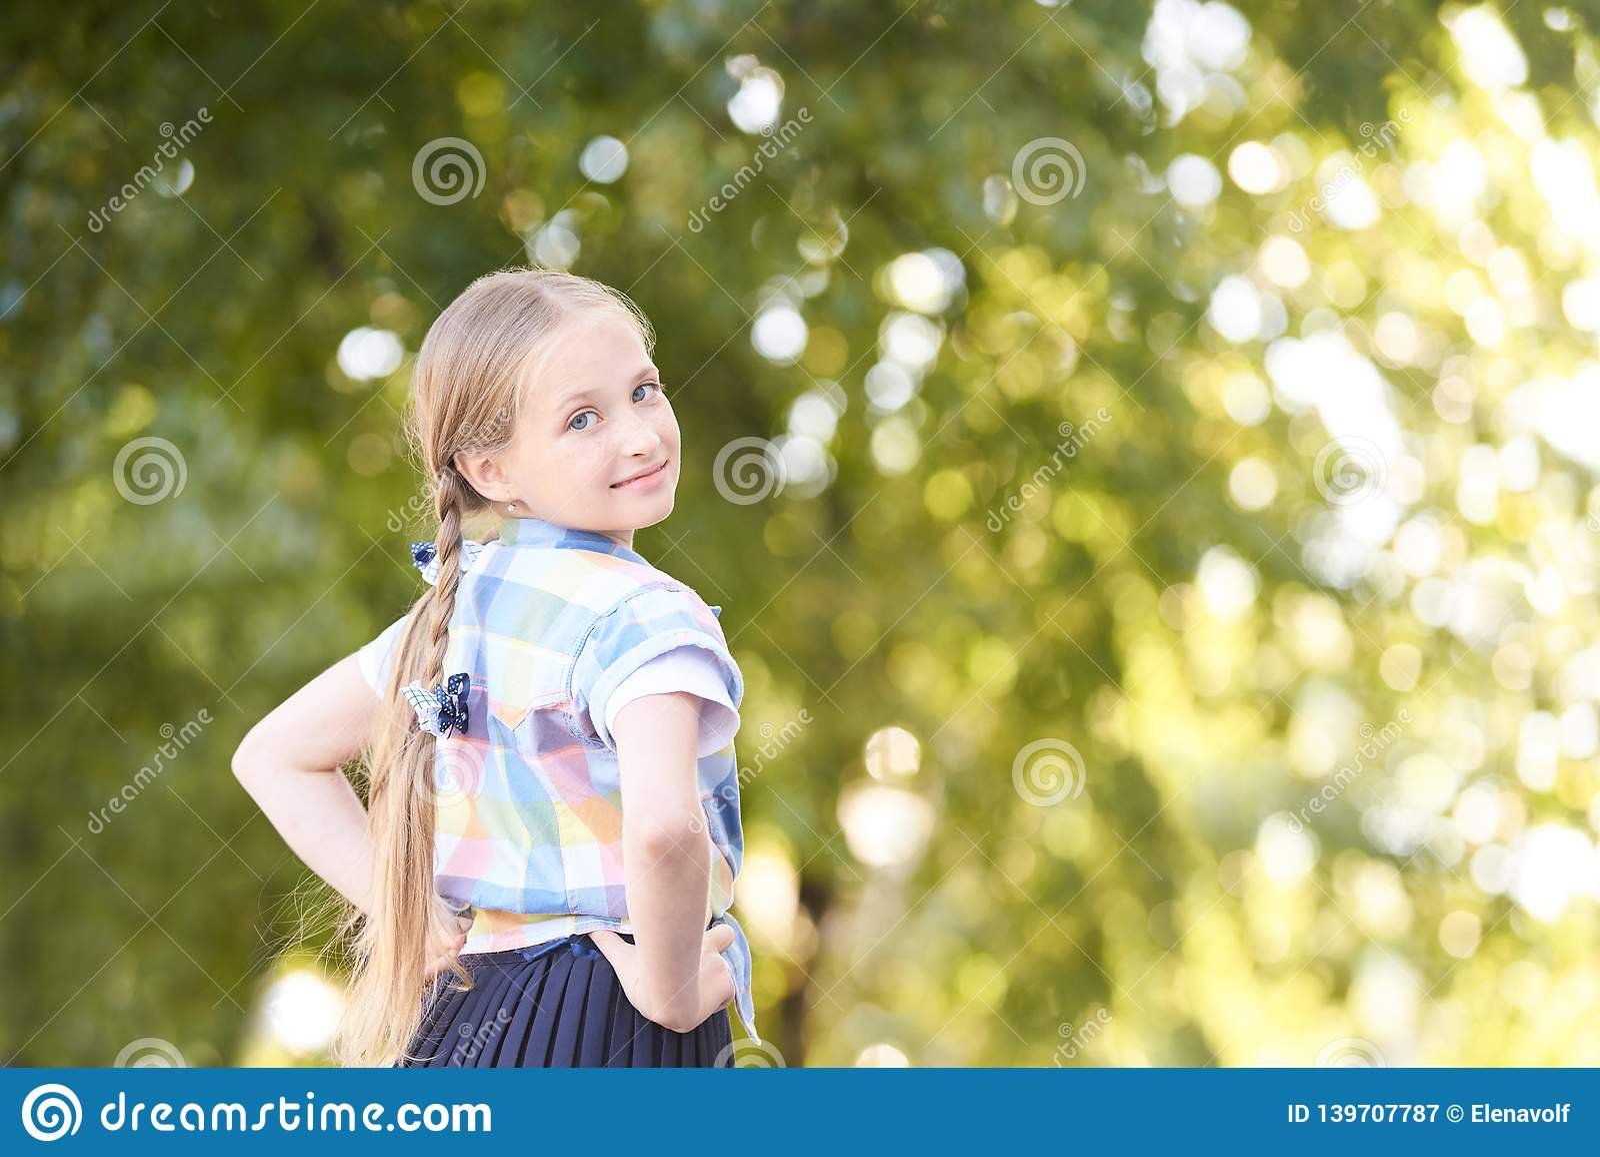 Little girl in green sunny forest along. Fun schoolgirl outside. Selective focus